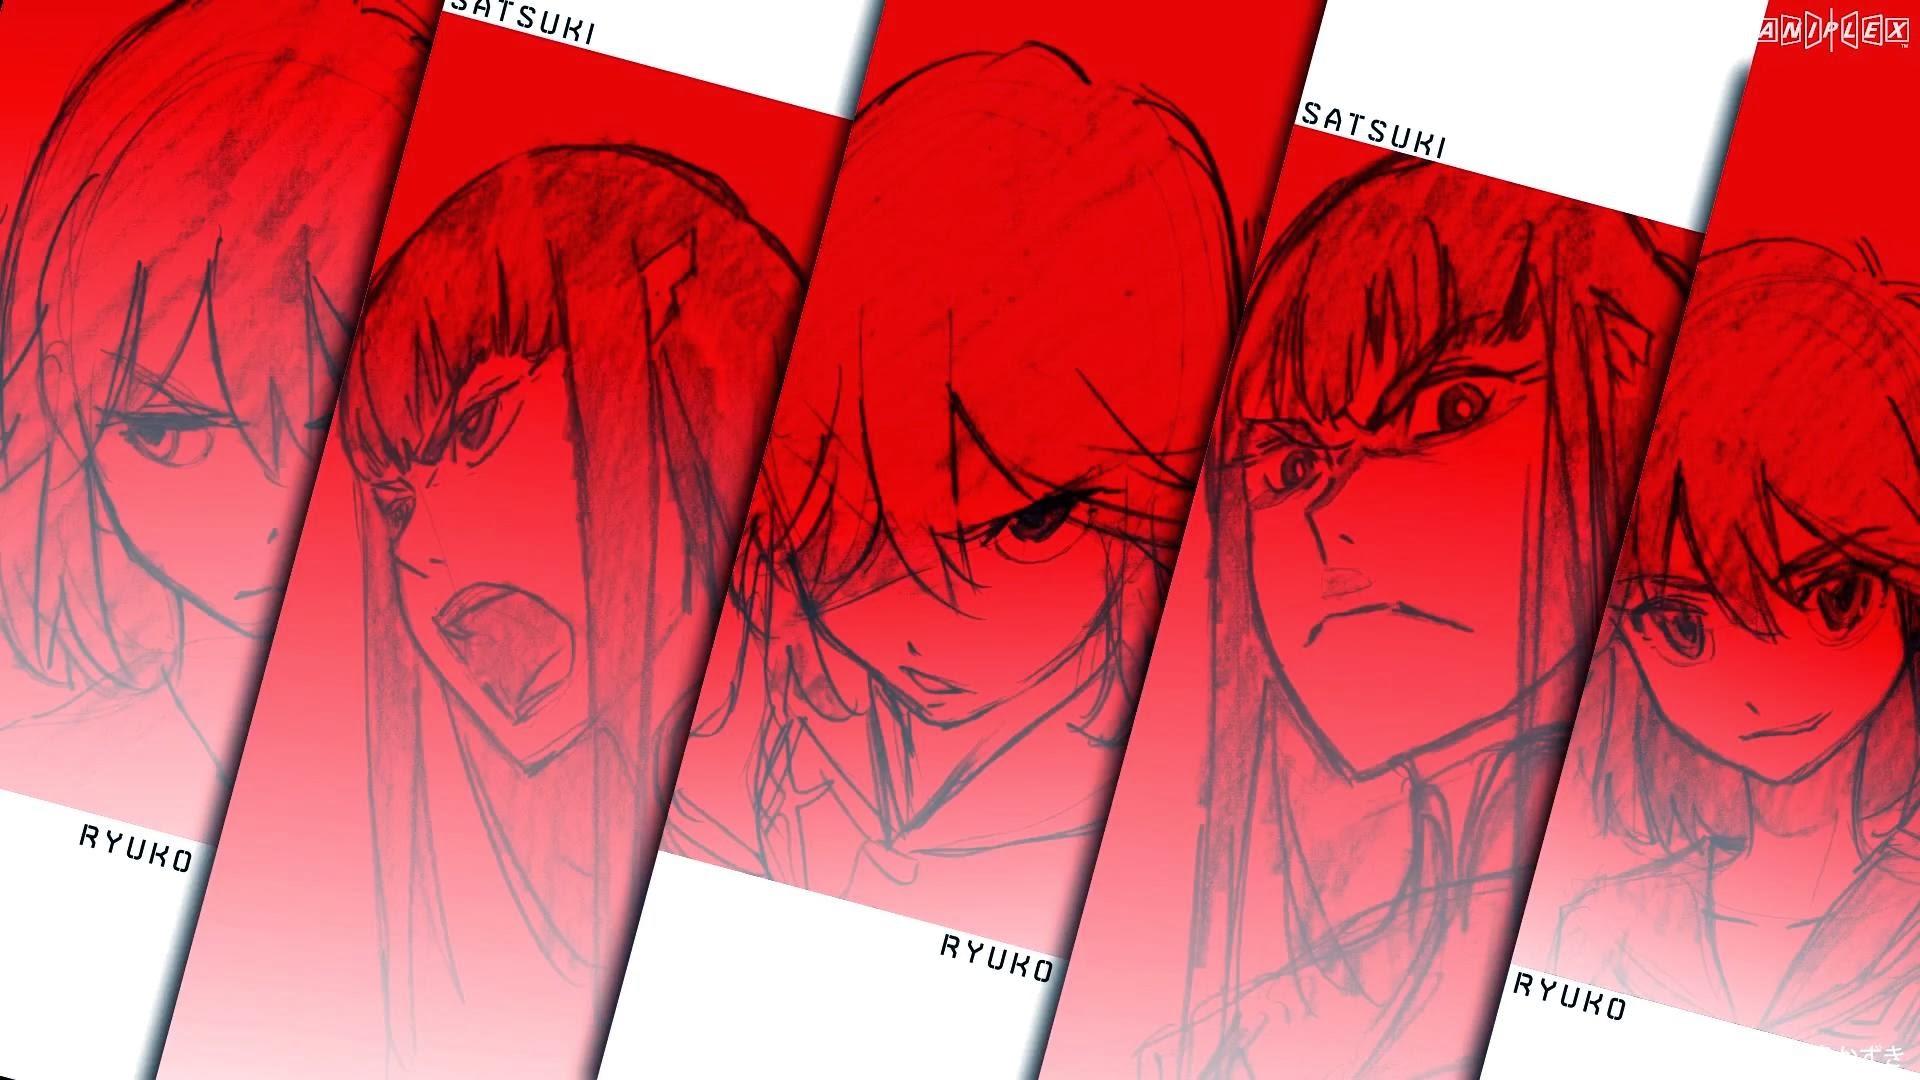 kill la kill anime picture hd wallpaper 1920x1080 4f 1920x1080